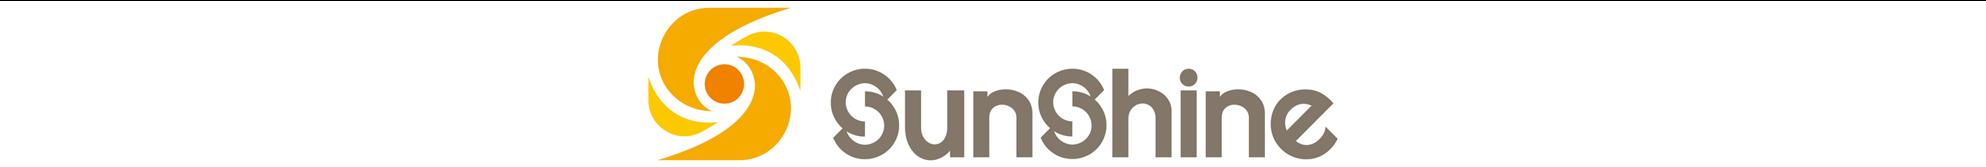 SunShine-Solver